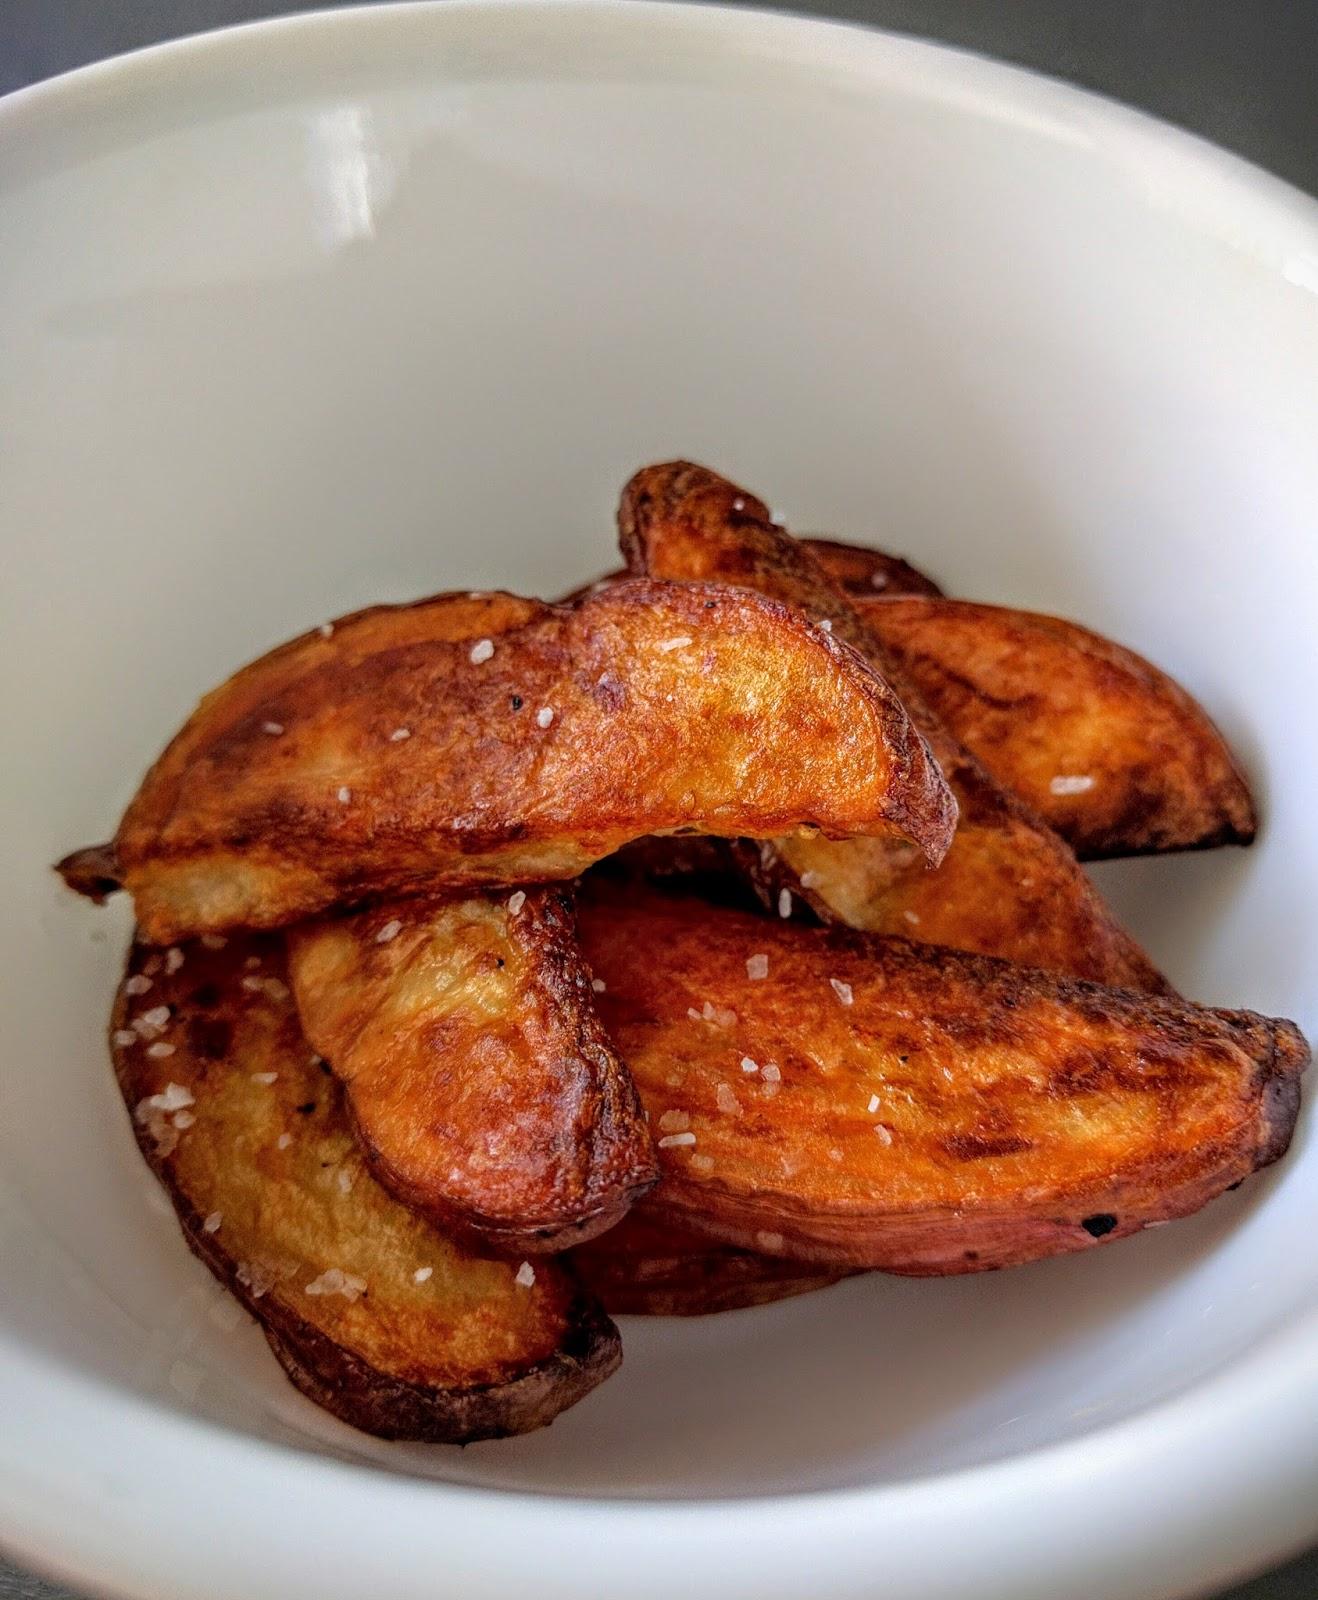 america's test kitchen crispy roasted potatoes